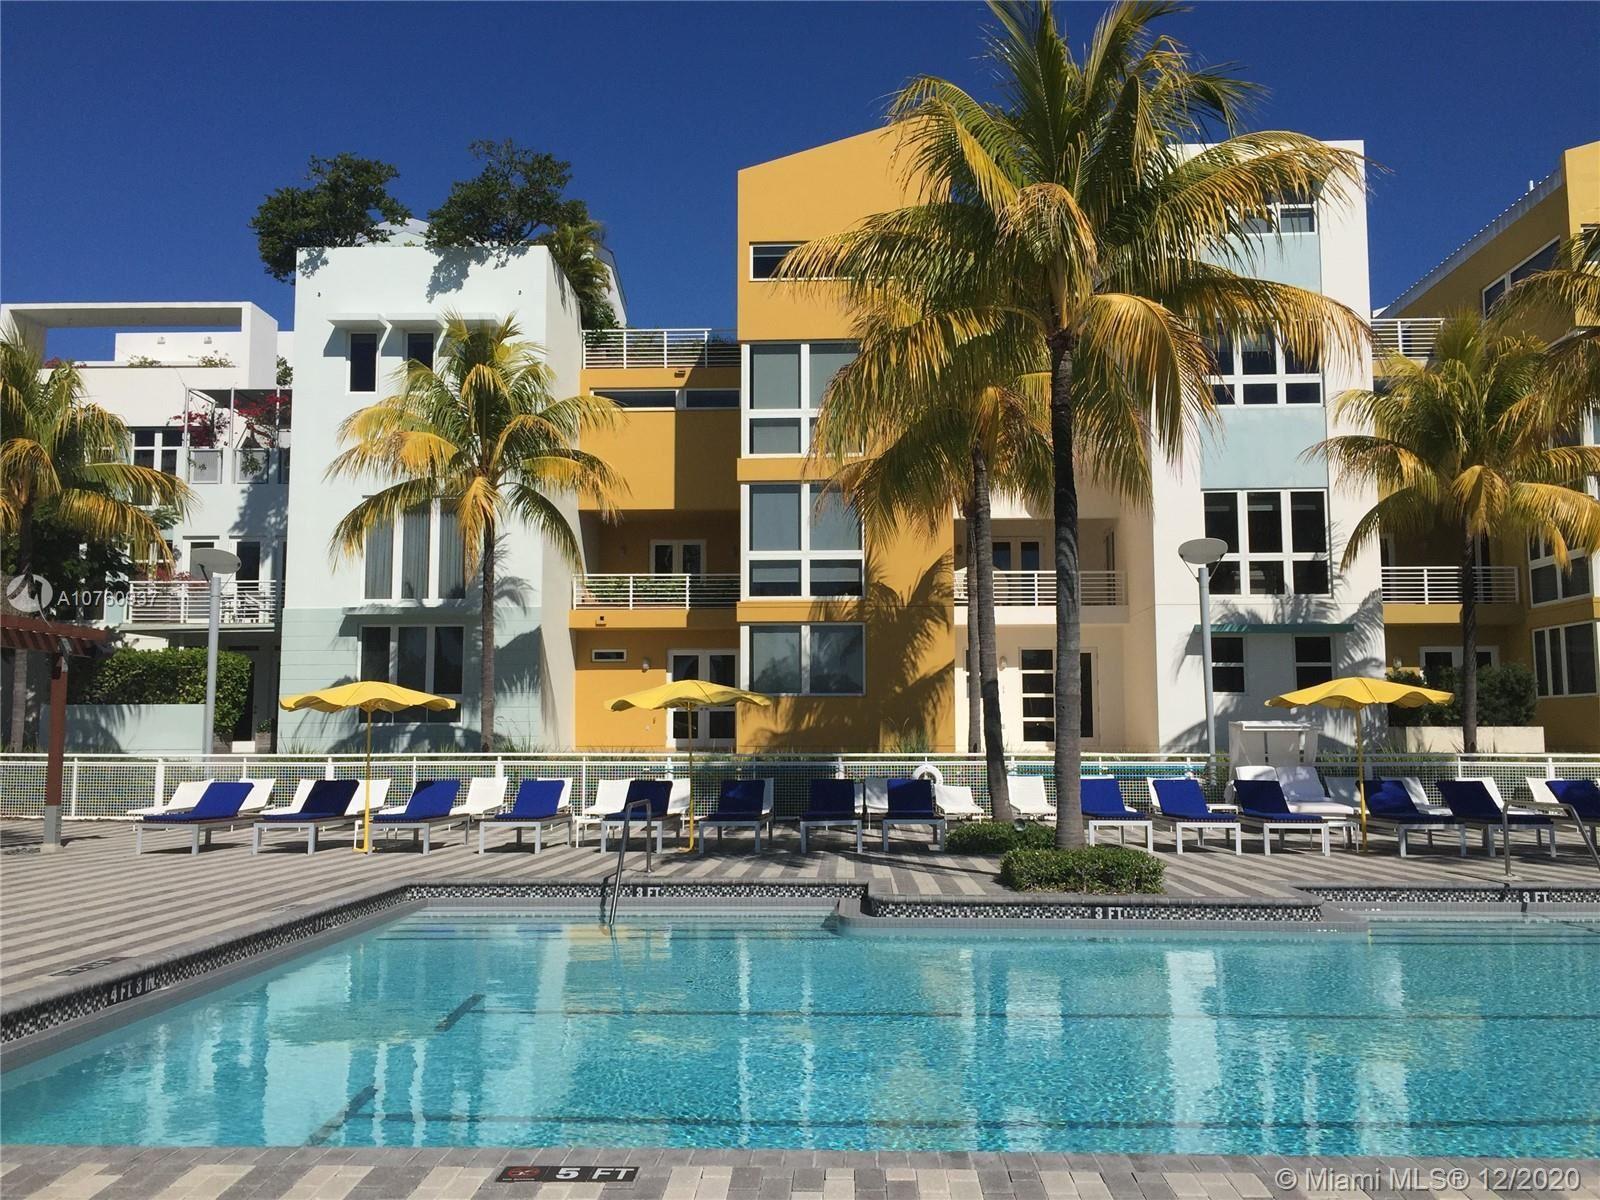 217 Aqua Ter #217, Miami Beach, FL 33141 - #: A10760937